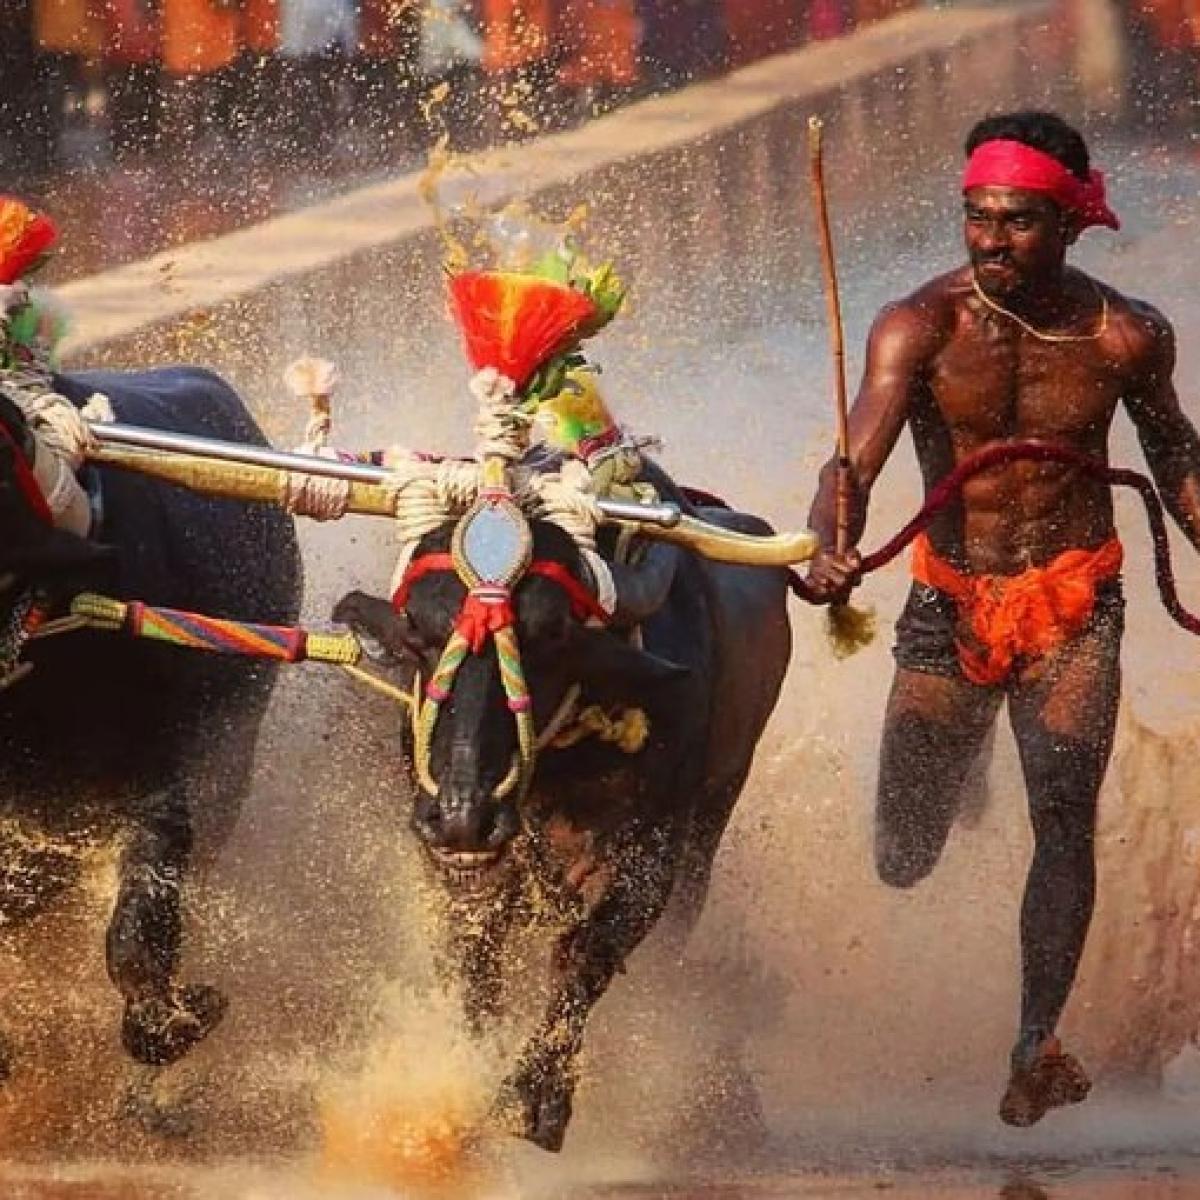 'Bolt is Bolt, Gowda is Gowda': Athletes urge caution amongst excitement over Karnataka buffalo jockey